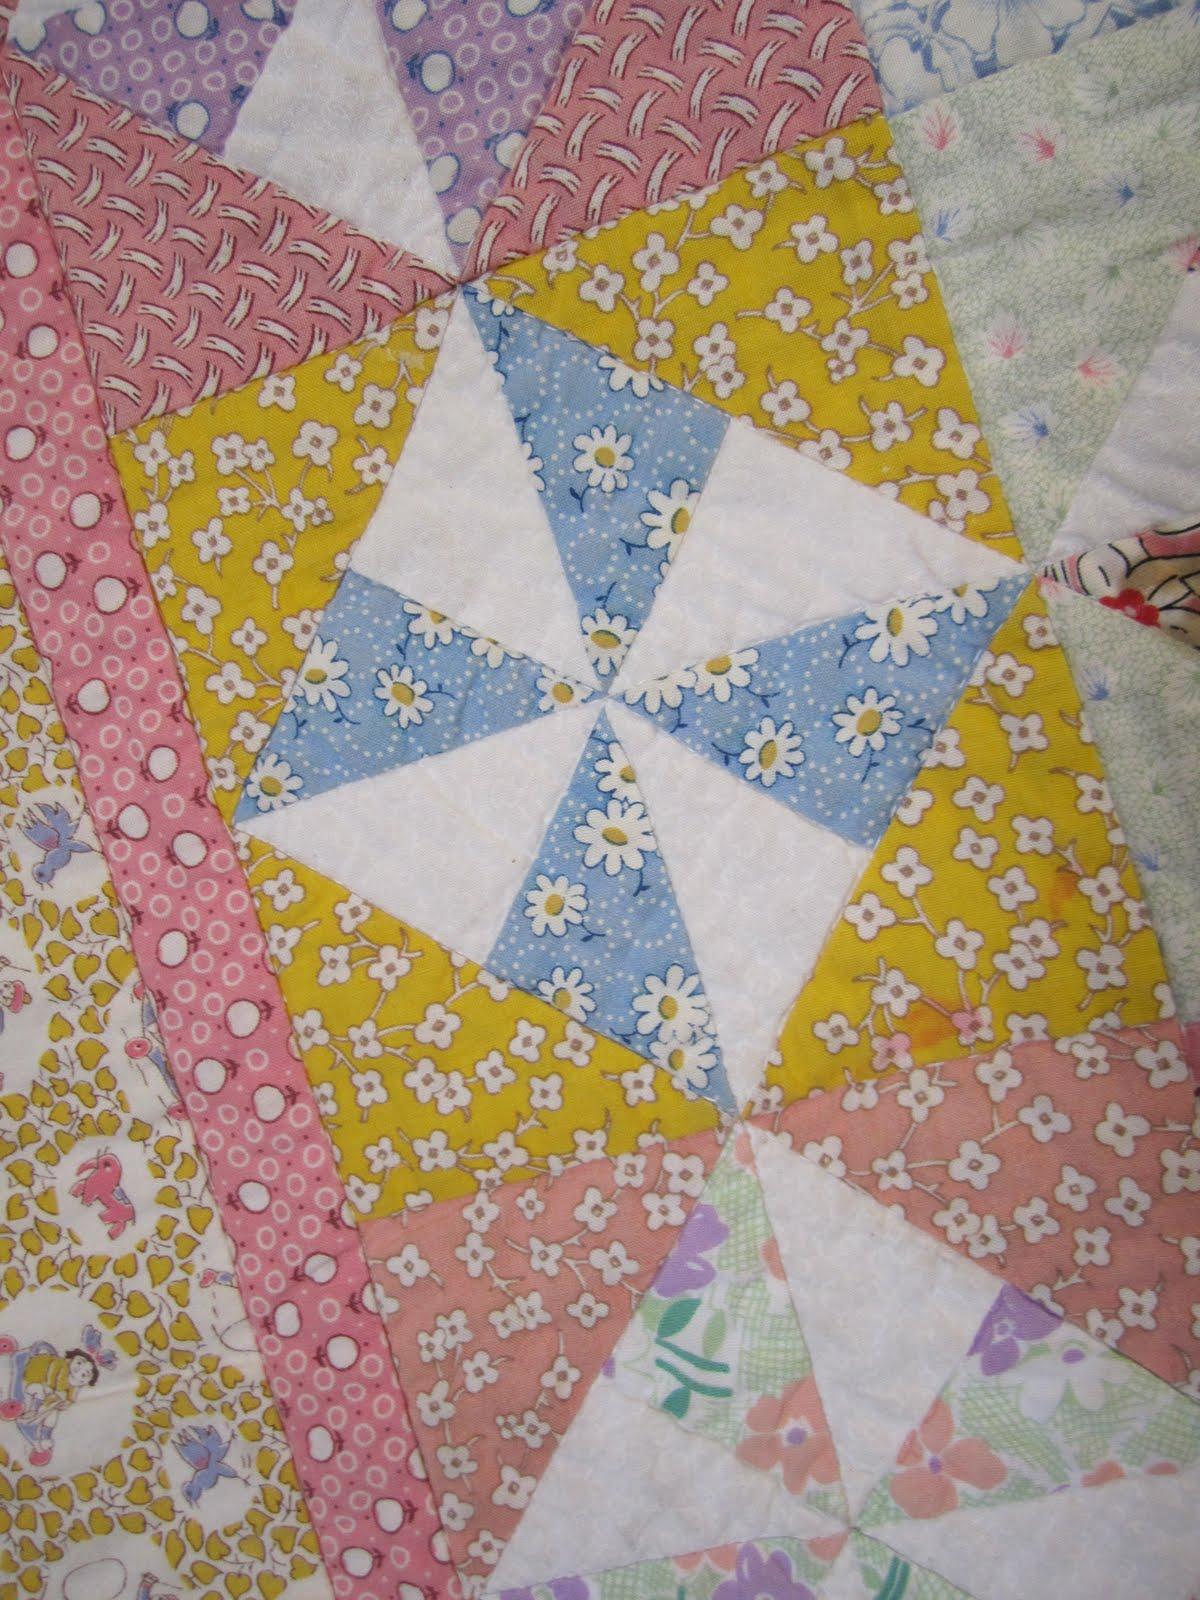 Pinwheel Quilt {Sewing} - Wendys Hat : baby pinwheel quilt - Adamdwight.com